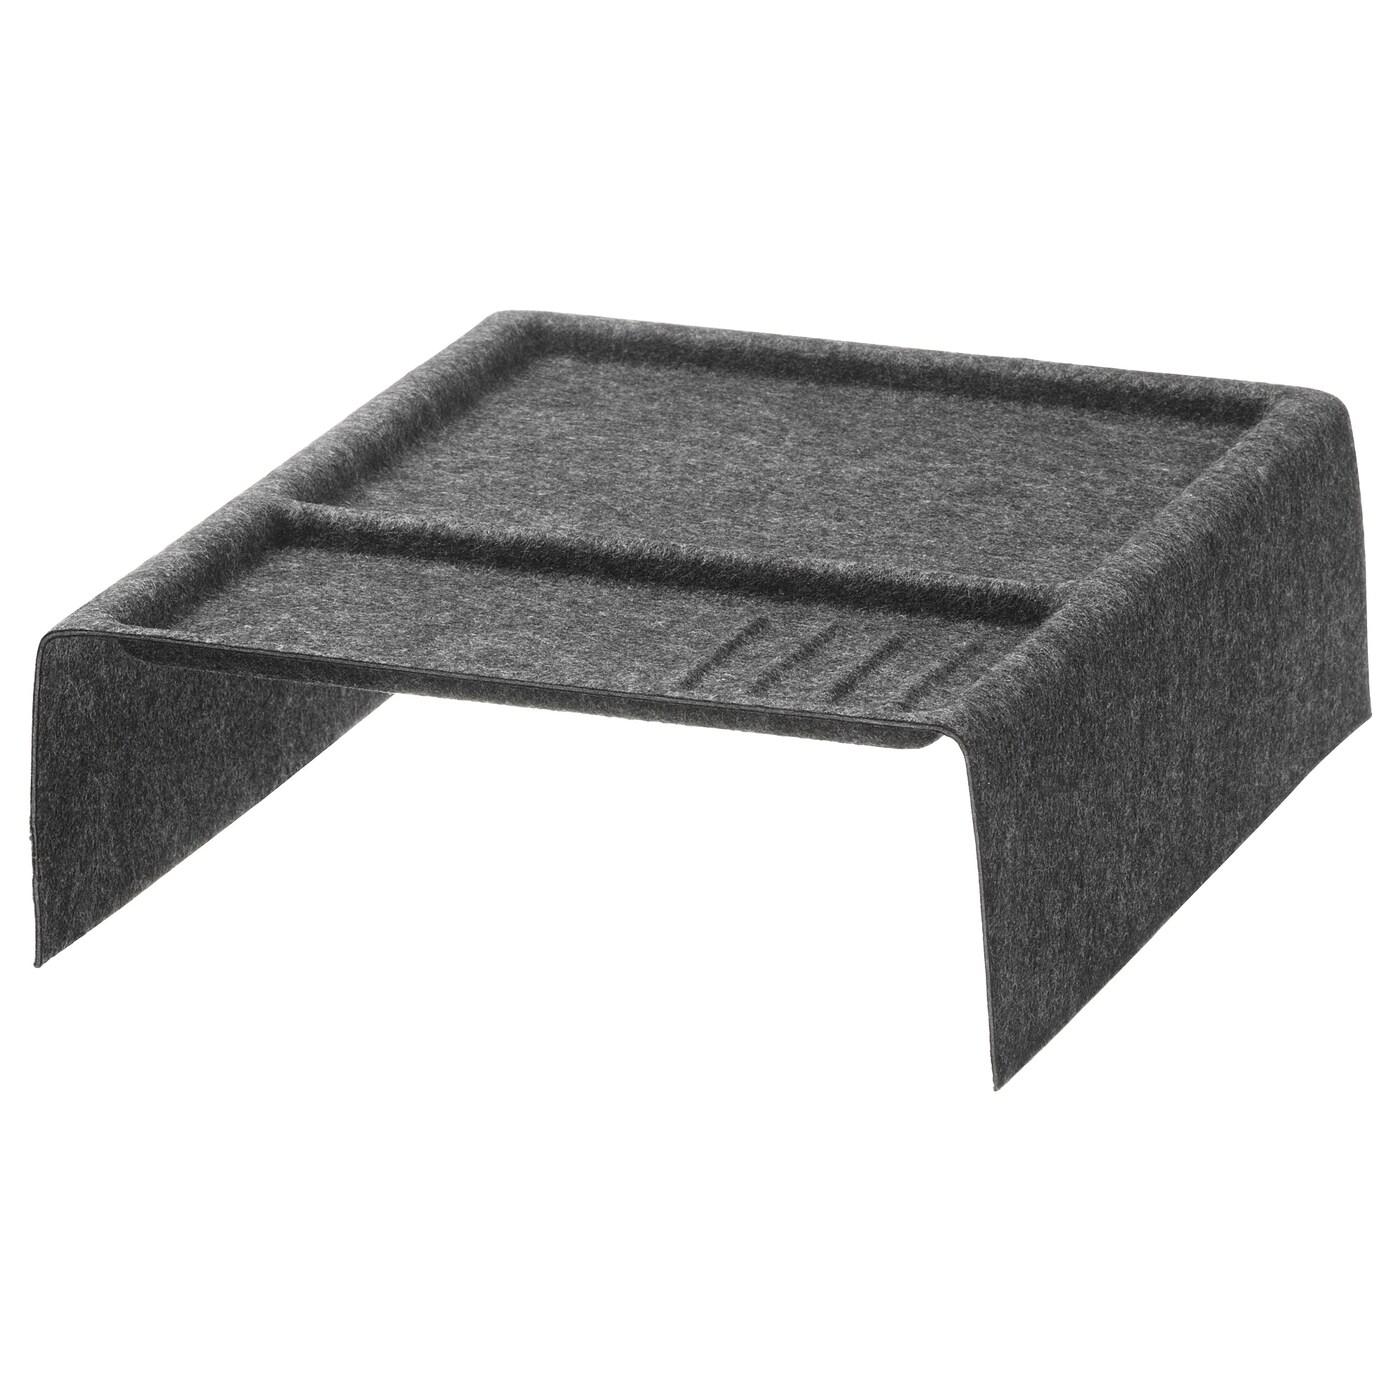 kallax rangement casiers gris fonc ikea. Black Bedroom Furniture Sets. Home Design Ideas